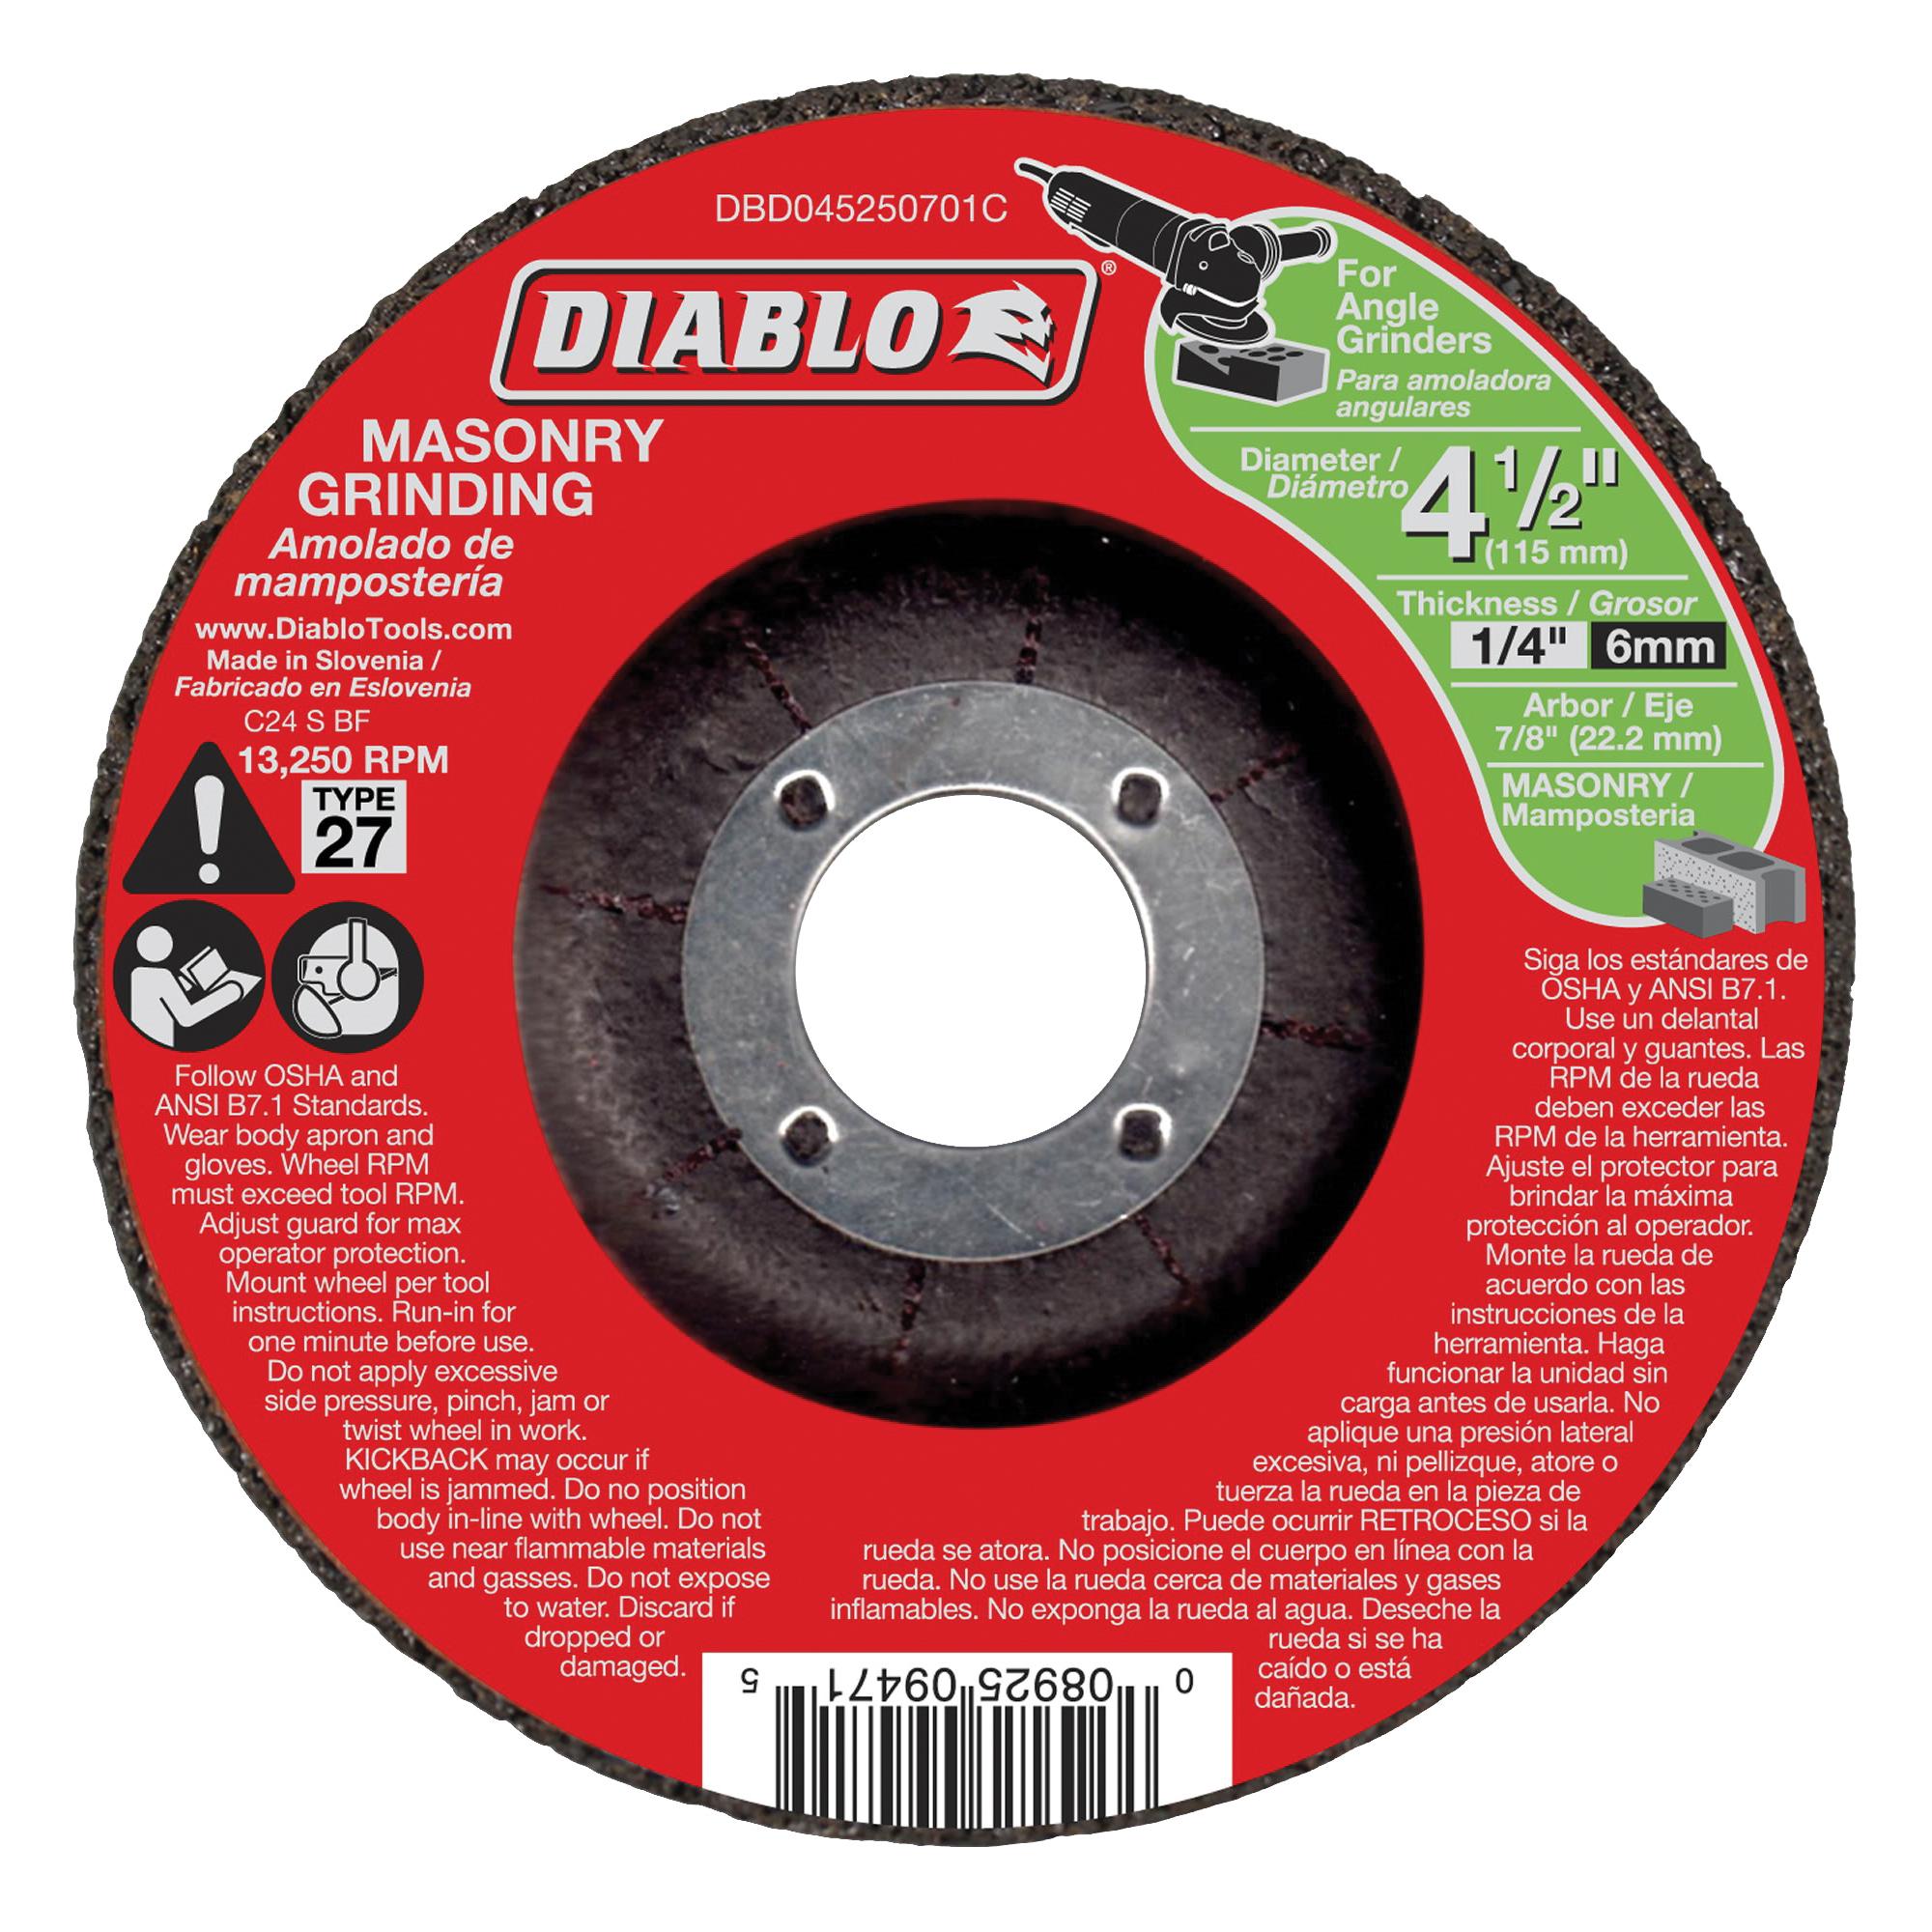 Picture of Diablo DBD045250701C Grinding Wheel, 4-1/2 in Dia, 1/4 in Thick, 7/8 in Arbor, Aluminum Oxide Abrasive